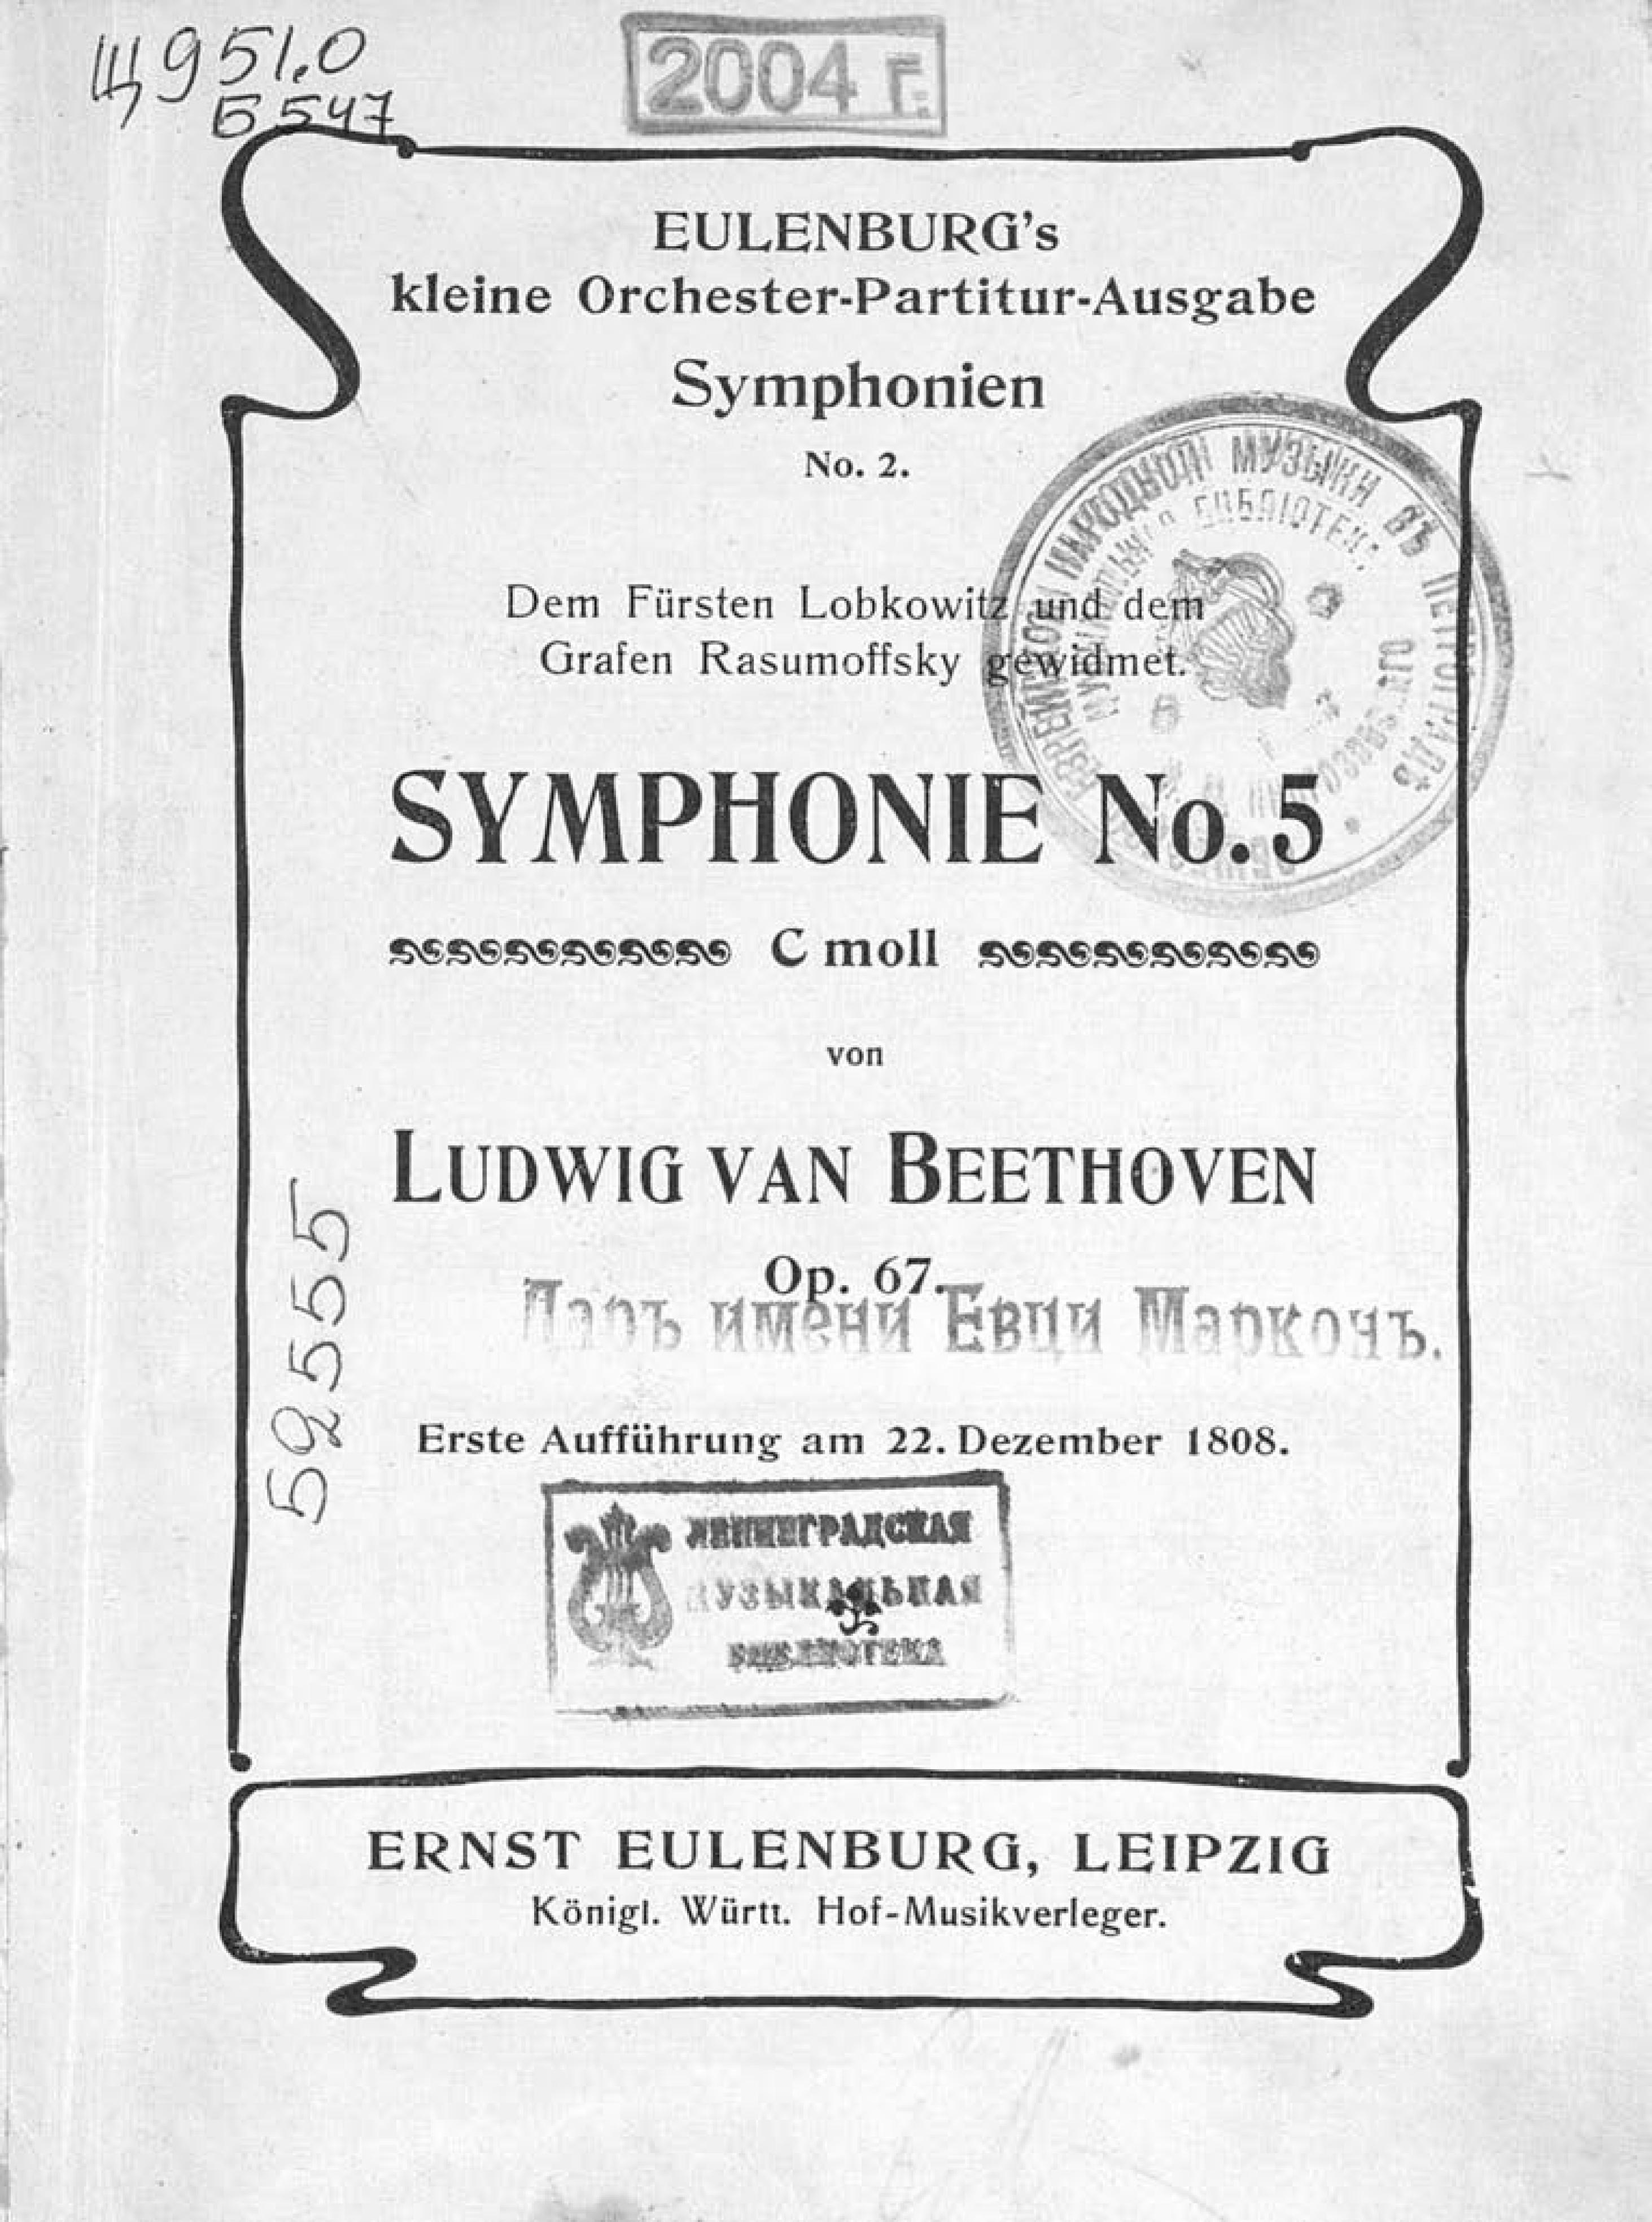 Людвиг ван Бетховен Symphonie № 5 c-moll, op. 67 von Ludwig van Beethoven часы rhythm cmg890gr02